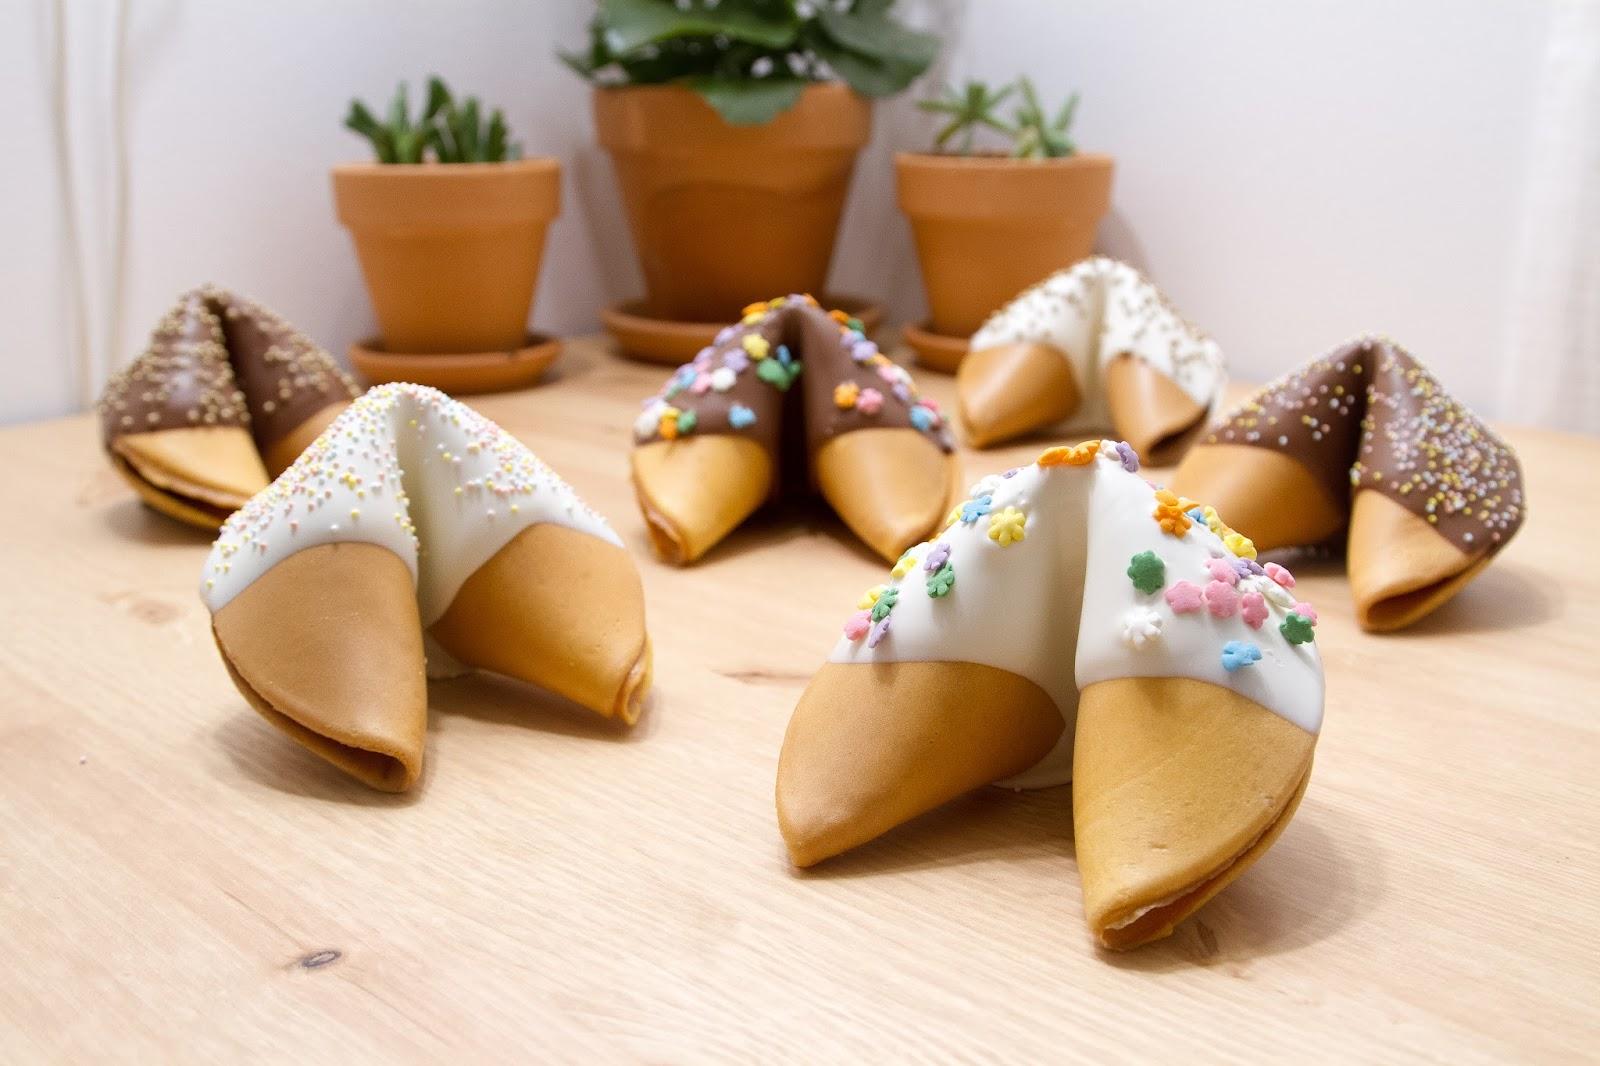 custom-giant-chocolate-dipped-fortune-cookie-display.jpg